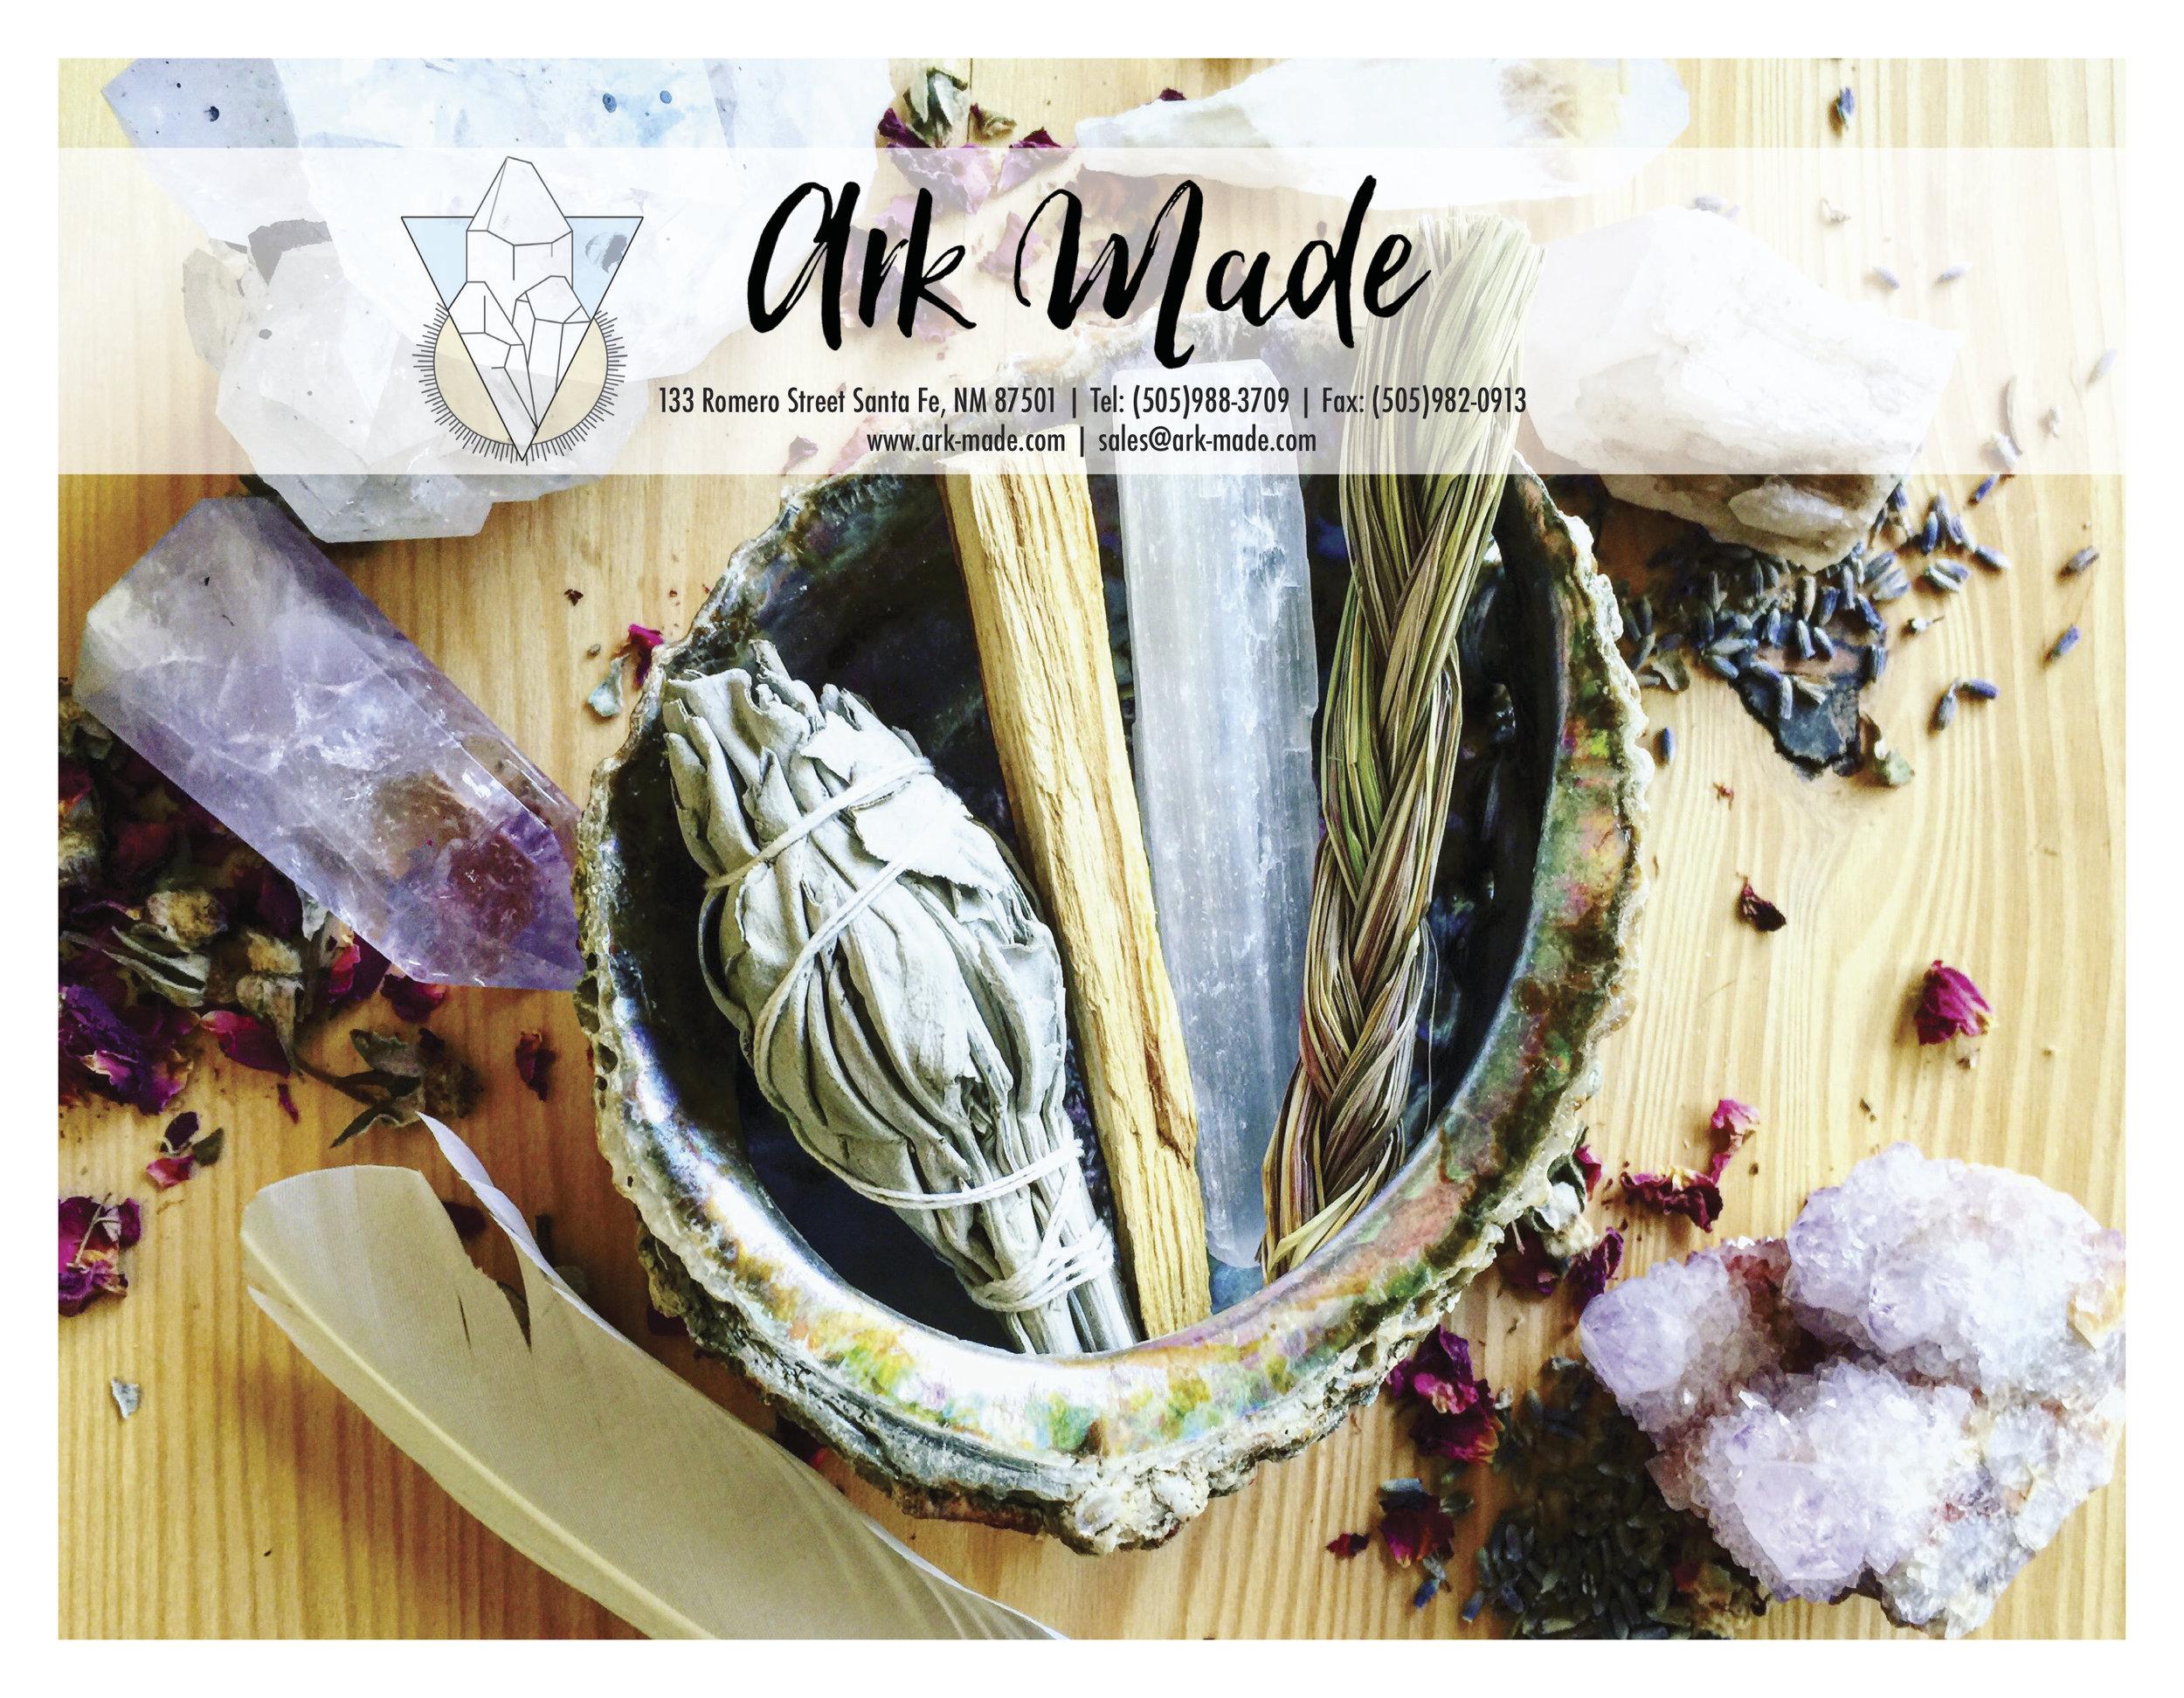 Ark Made Catalog | View the full catalog  here